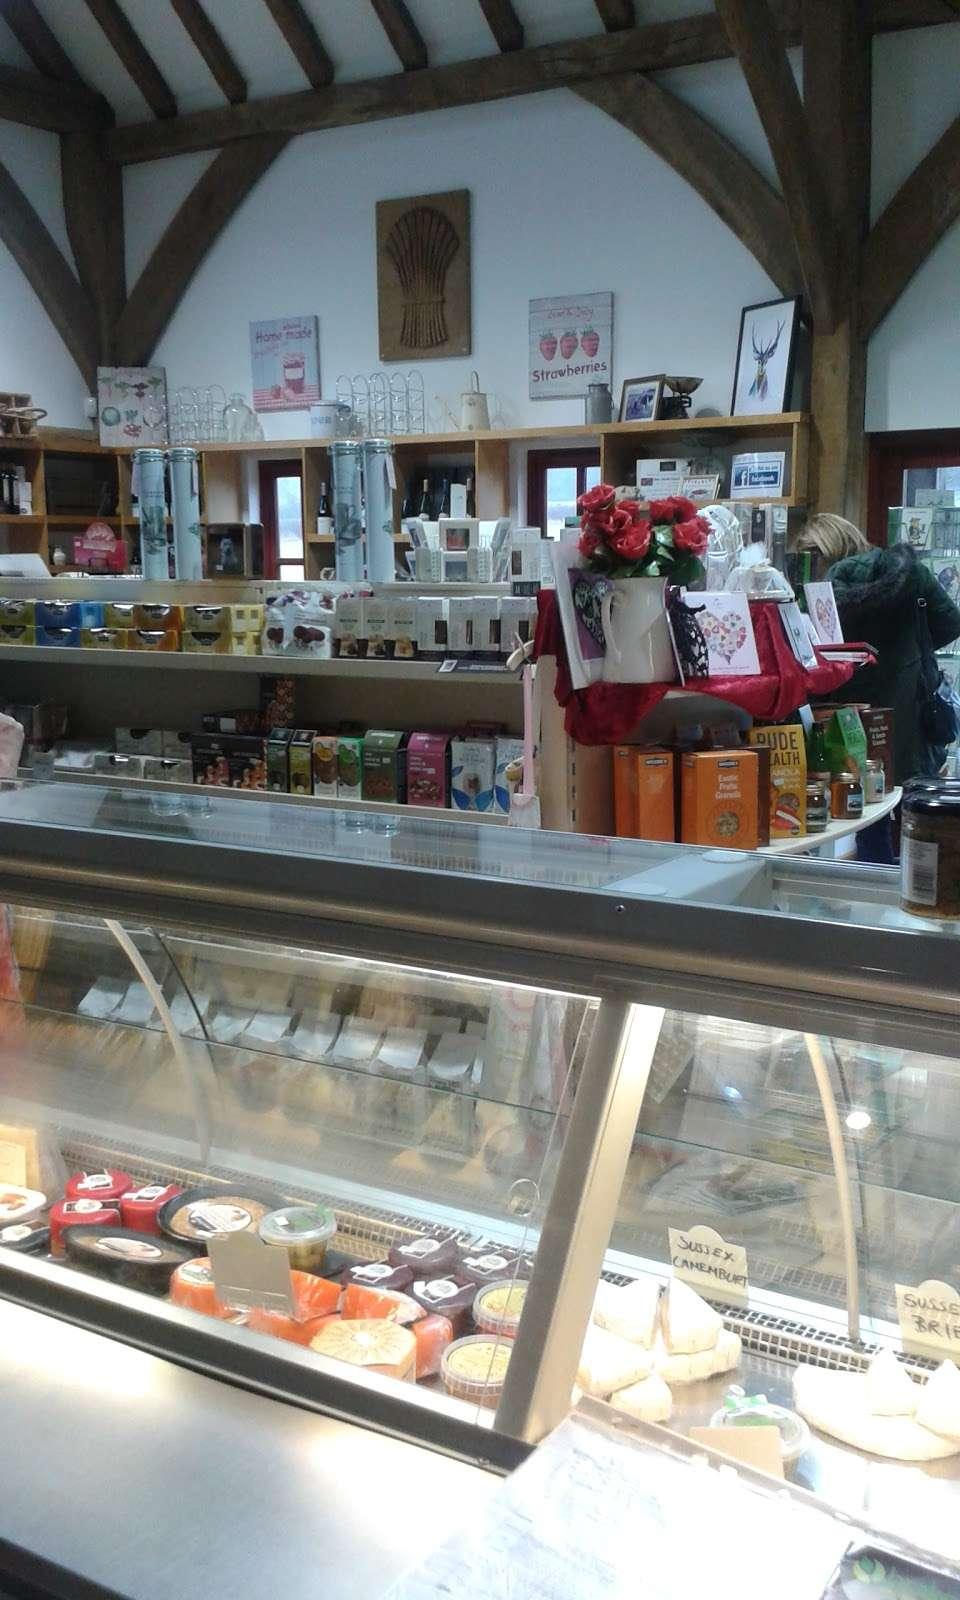 New House Farm Shop - cafe  | Photo 9 of 10 | Address: Old Crawley Rd, Faygate, Horsham RH12 4RU, UK | Phone: 01293 851890